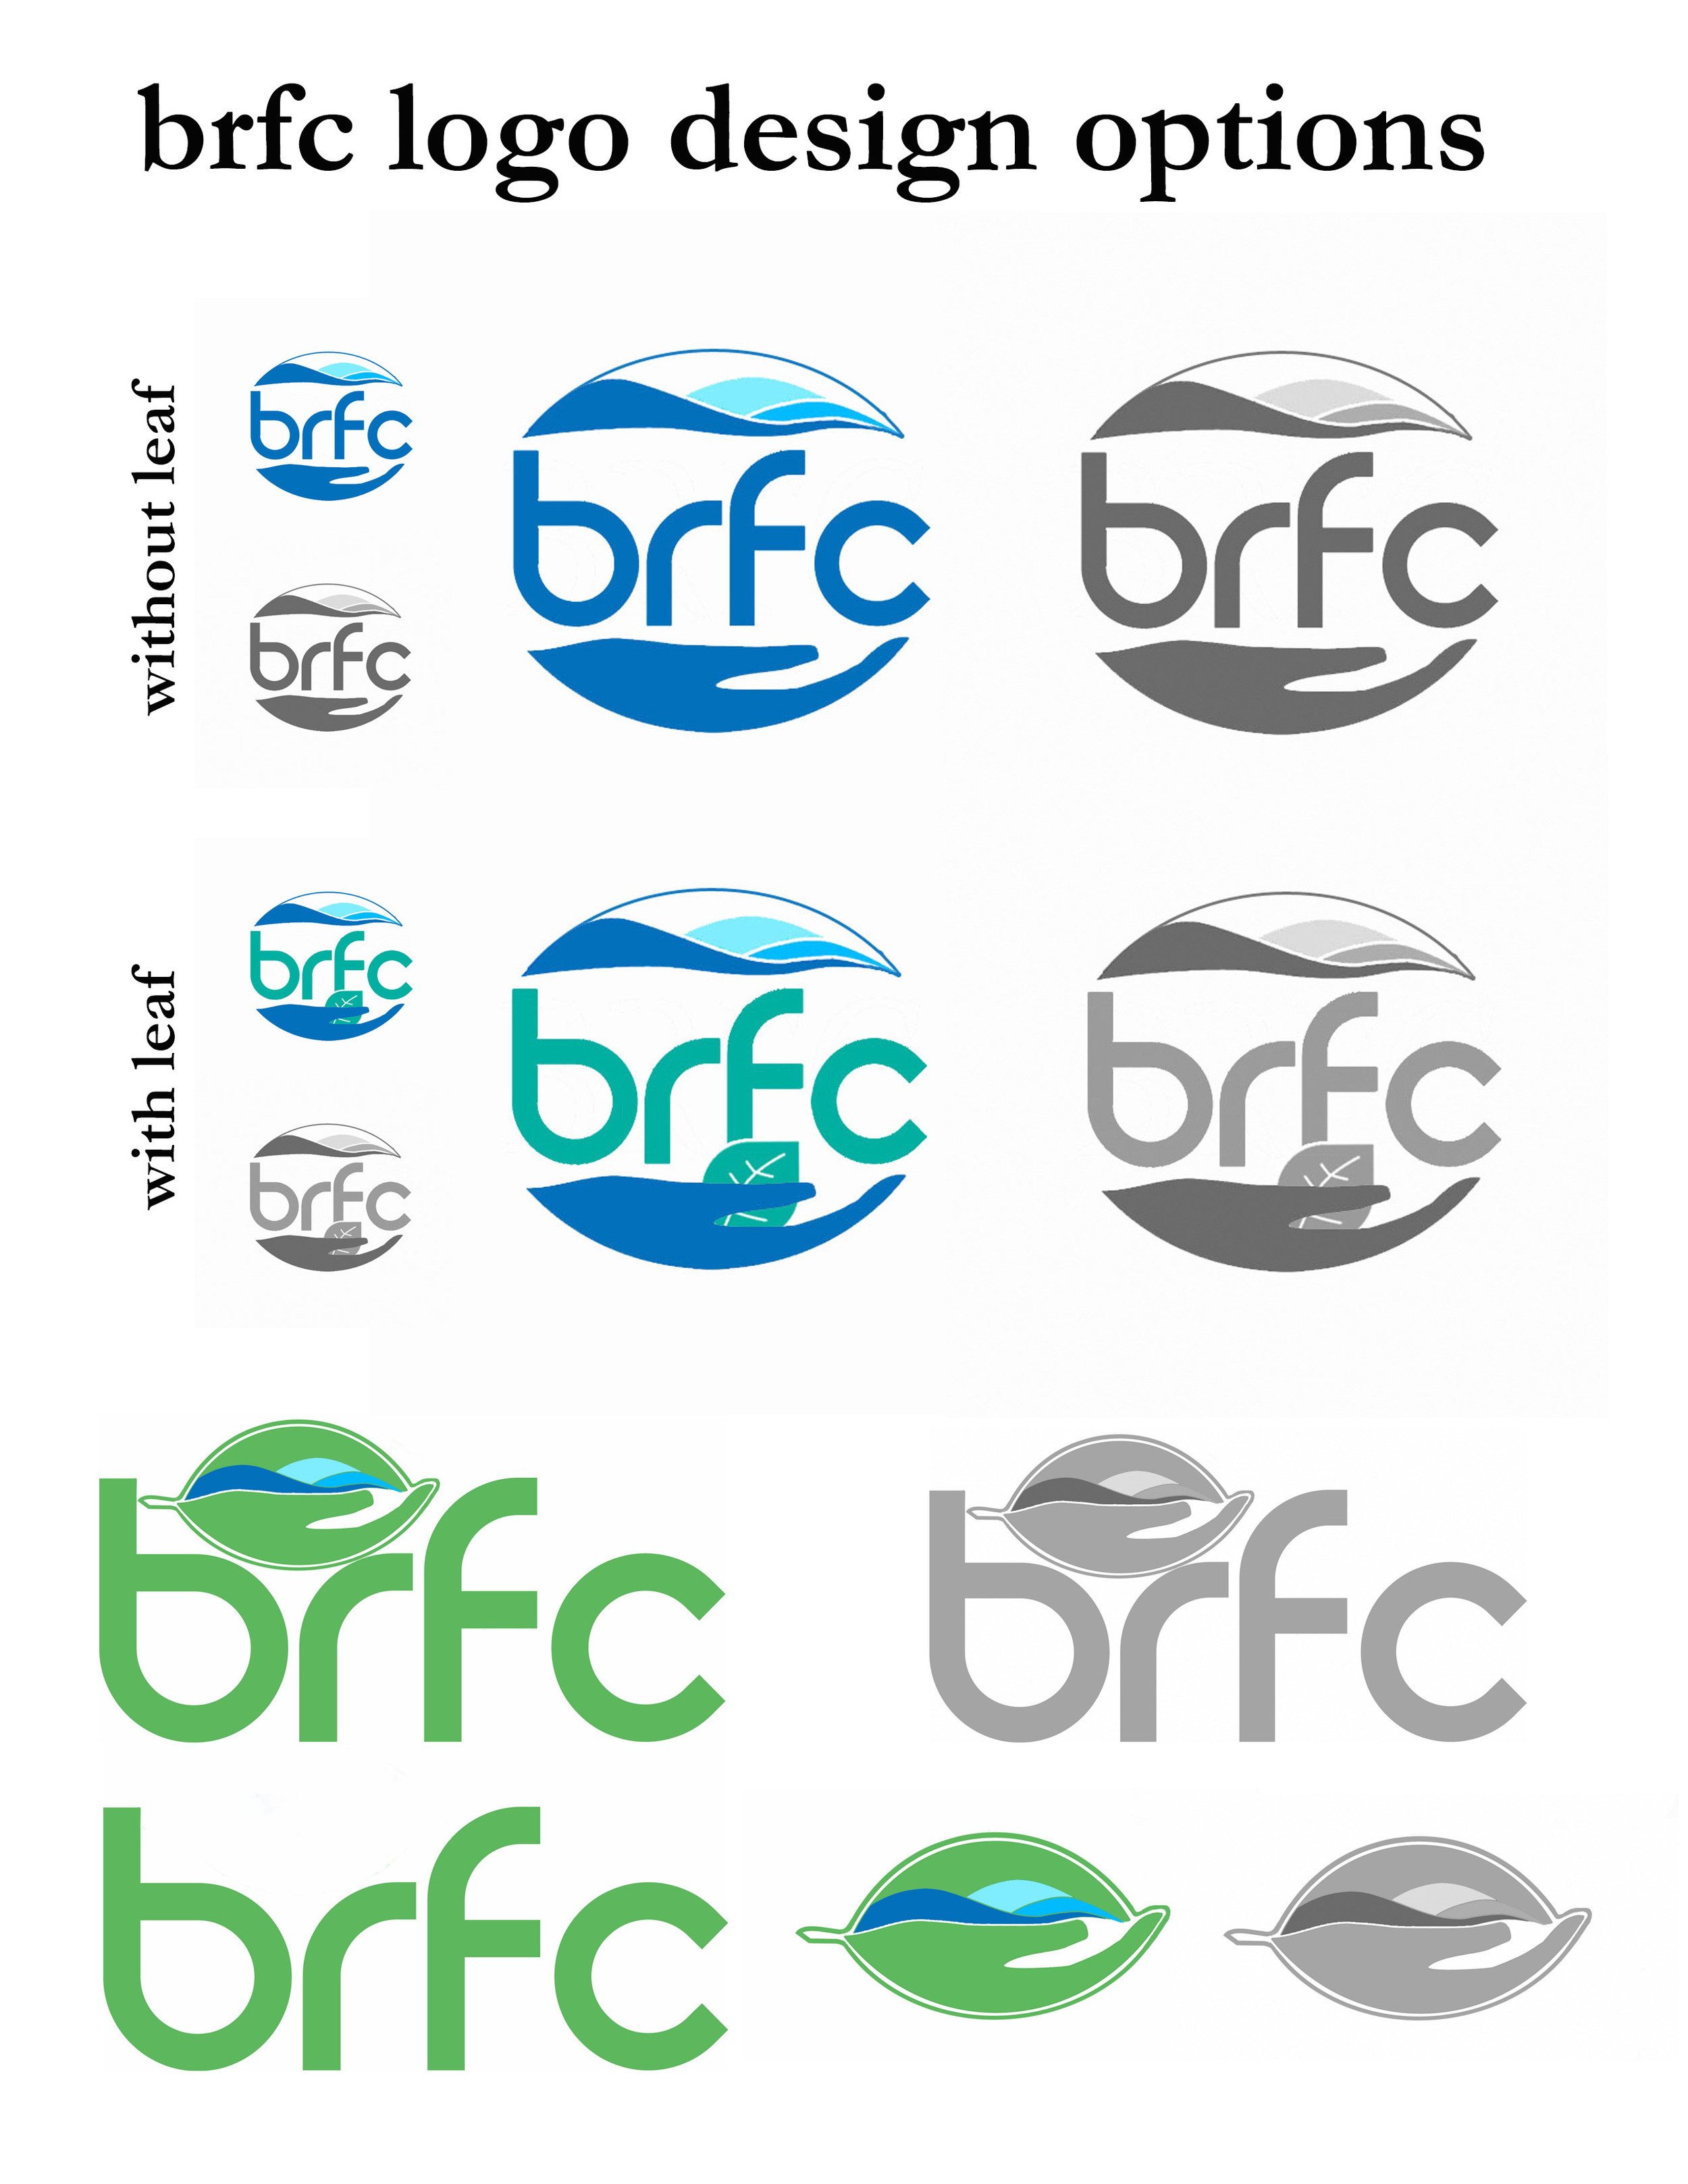 brfc logo design options.jpg